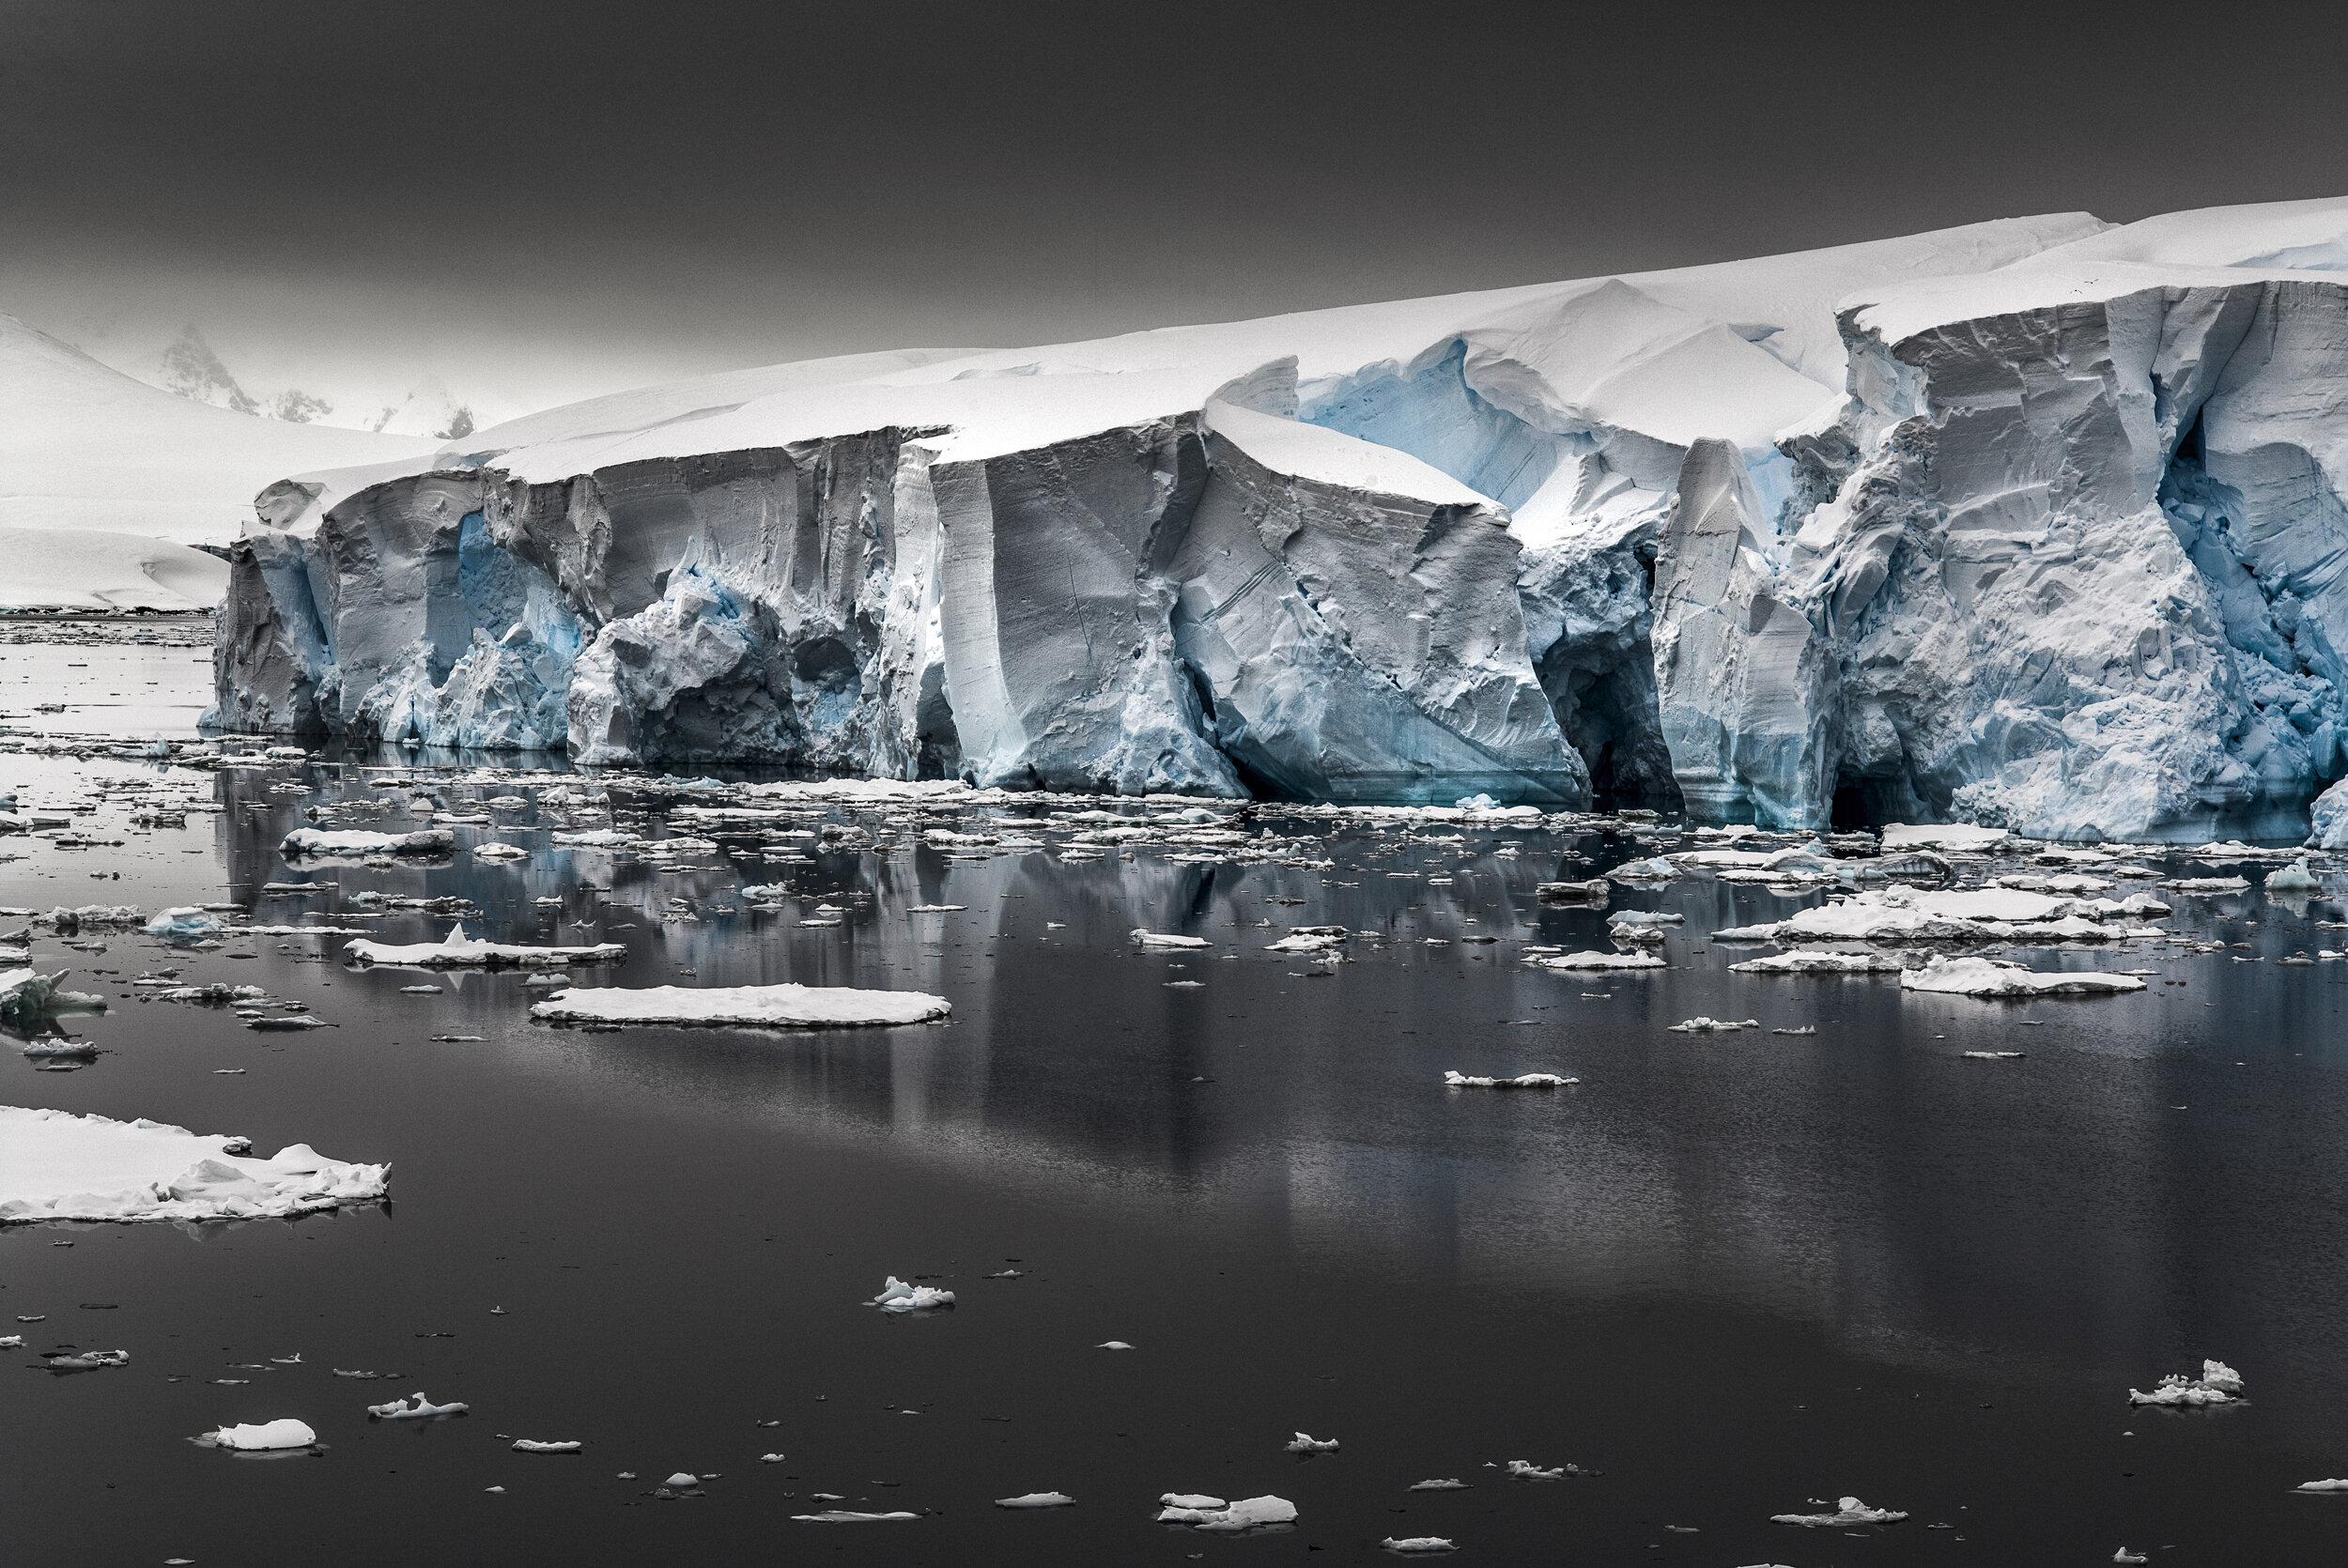 manuel_uebler_antarctica_twilight_003.jpg